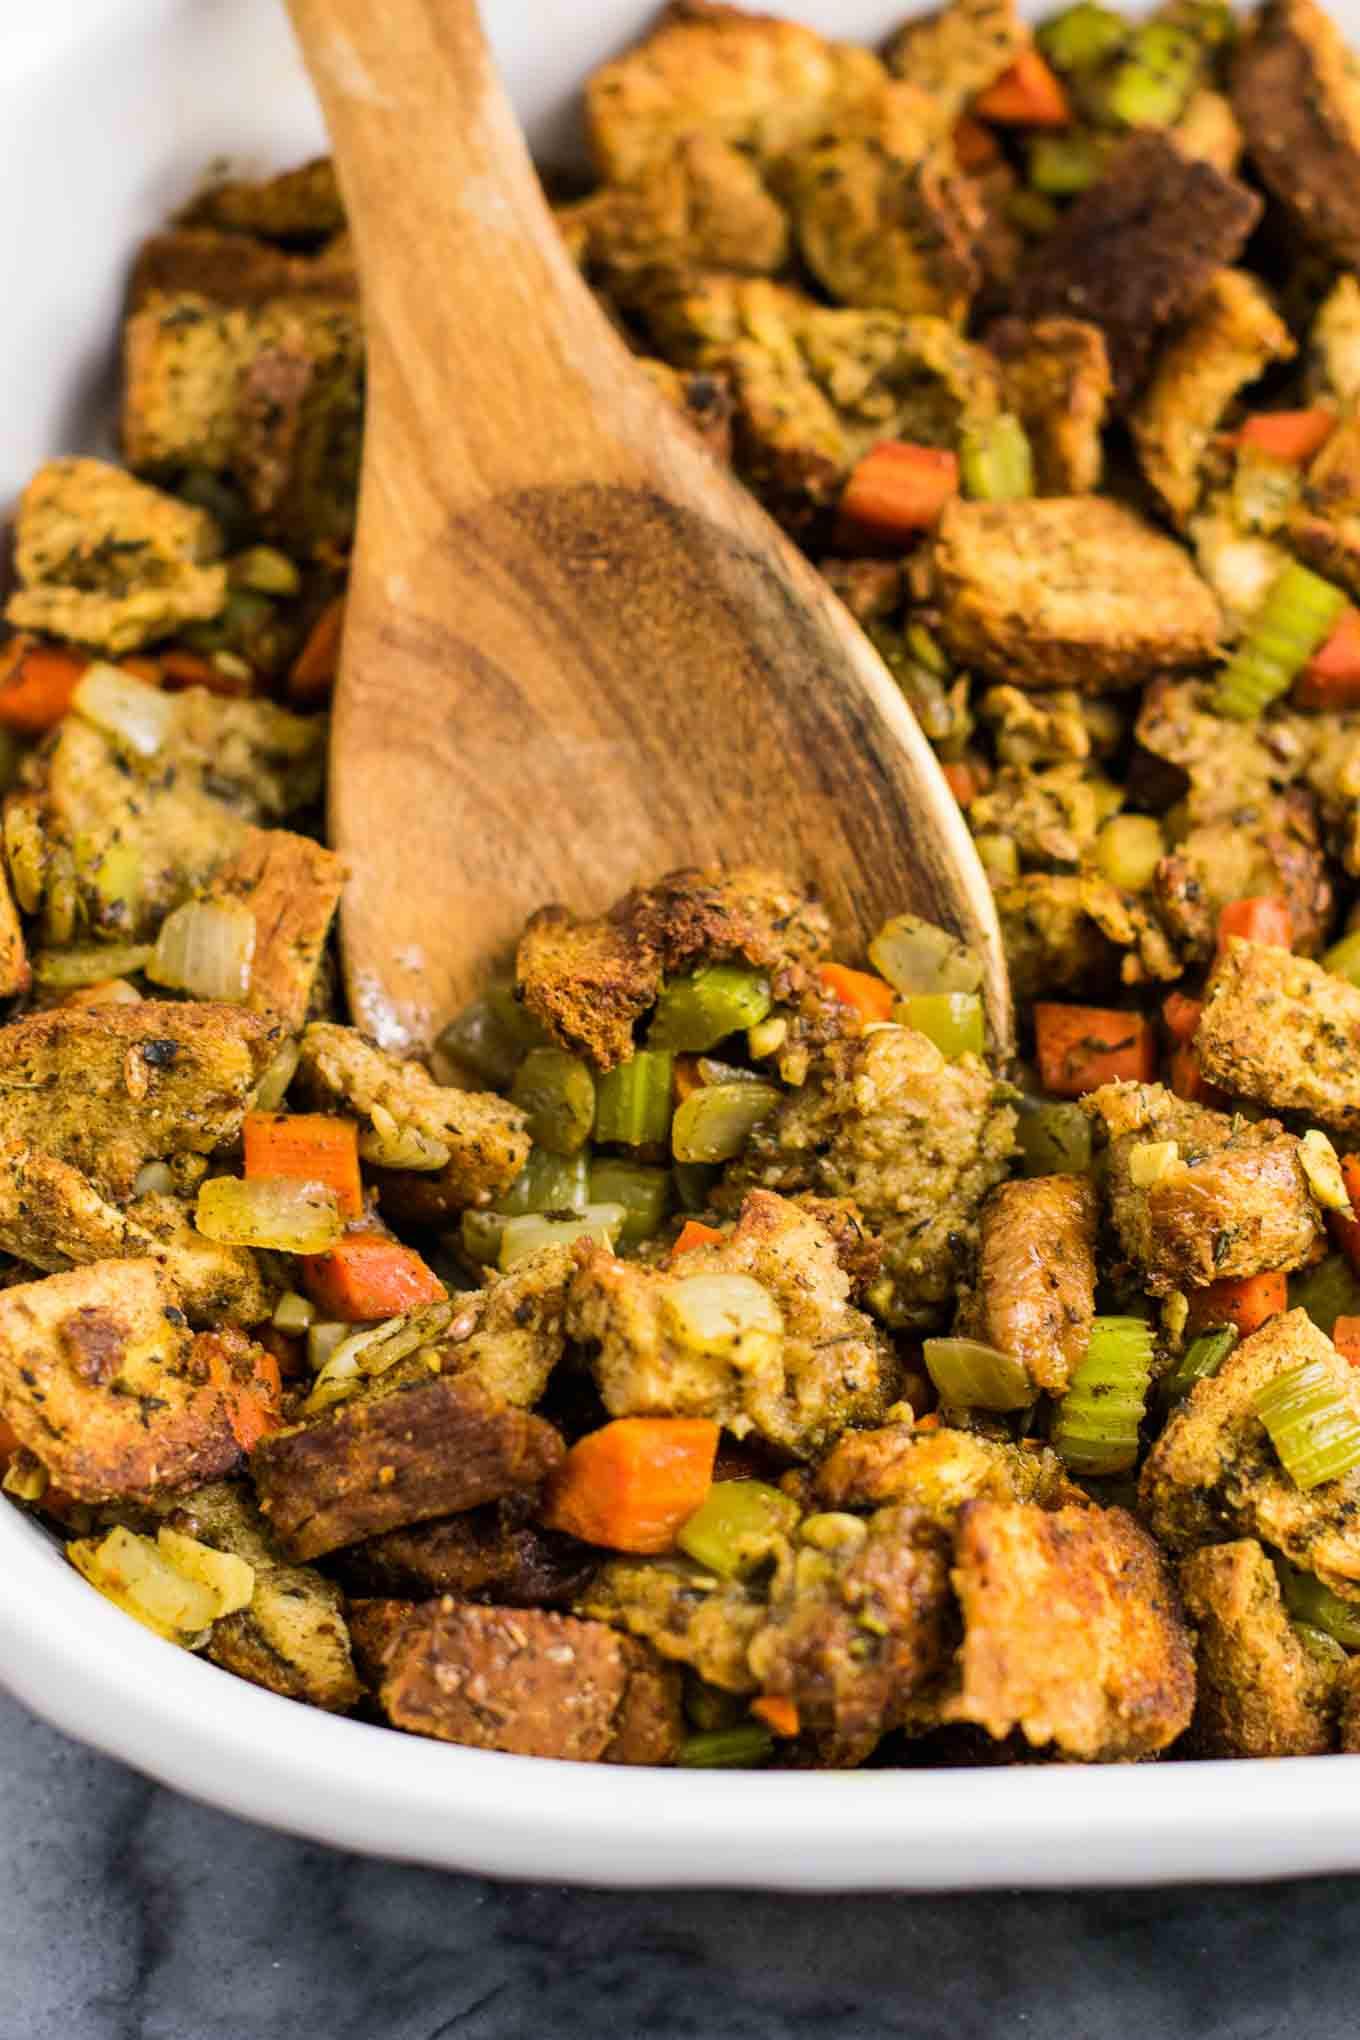 Vegan Stuffing Recipes For Thanksgiving  The Best Easy Vegan Stuffing Recipe Build Your Bite